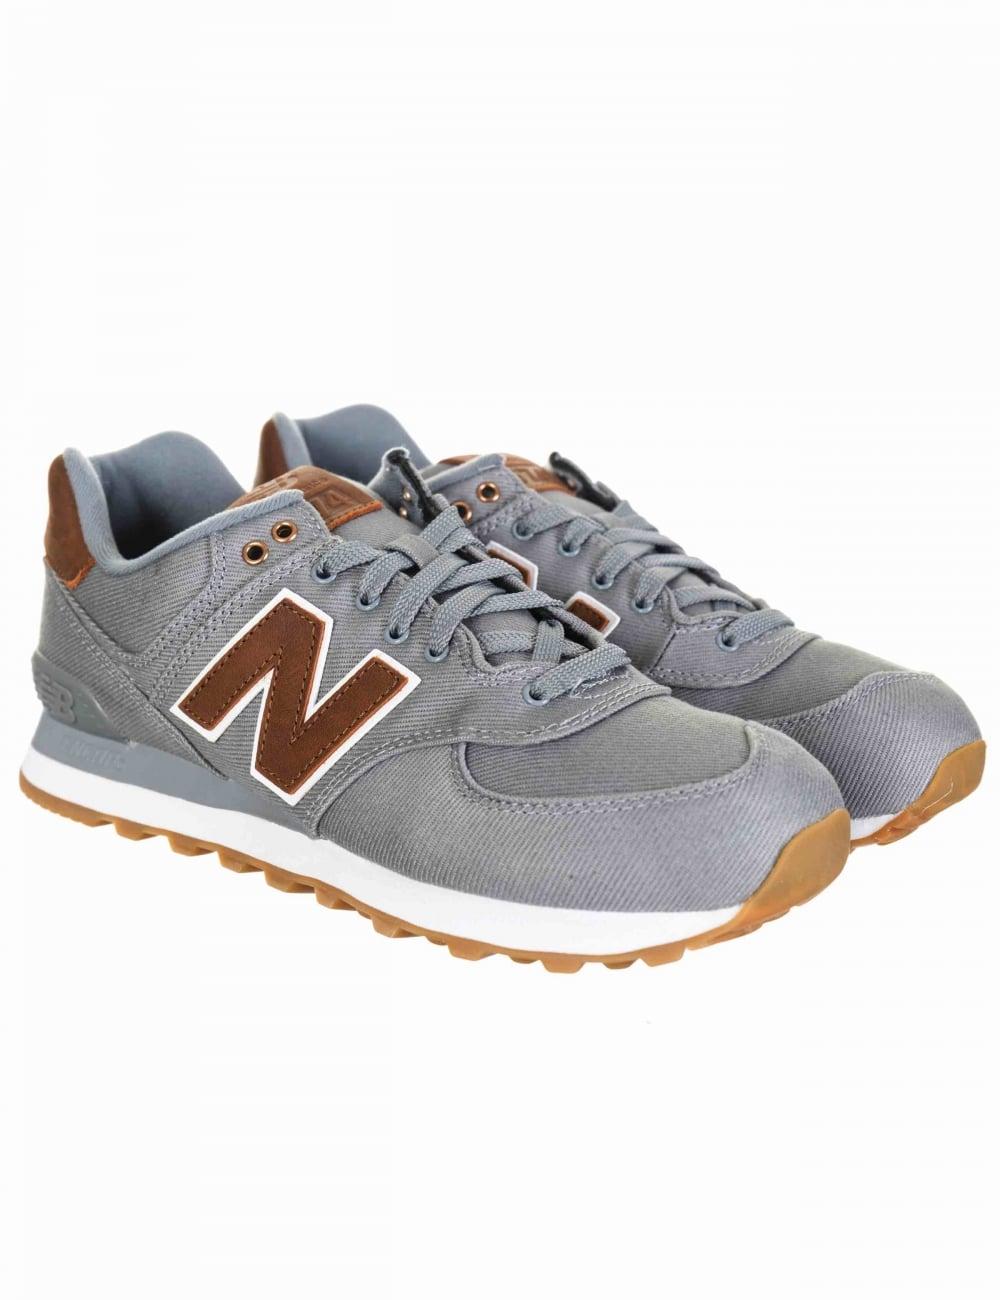 check out 0d4a8 98a1e ML574TXC Shoes - Grey/Tan